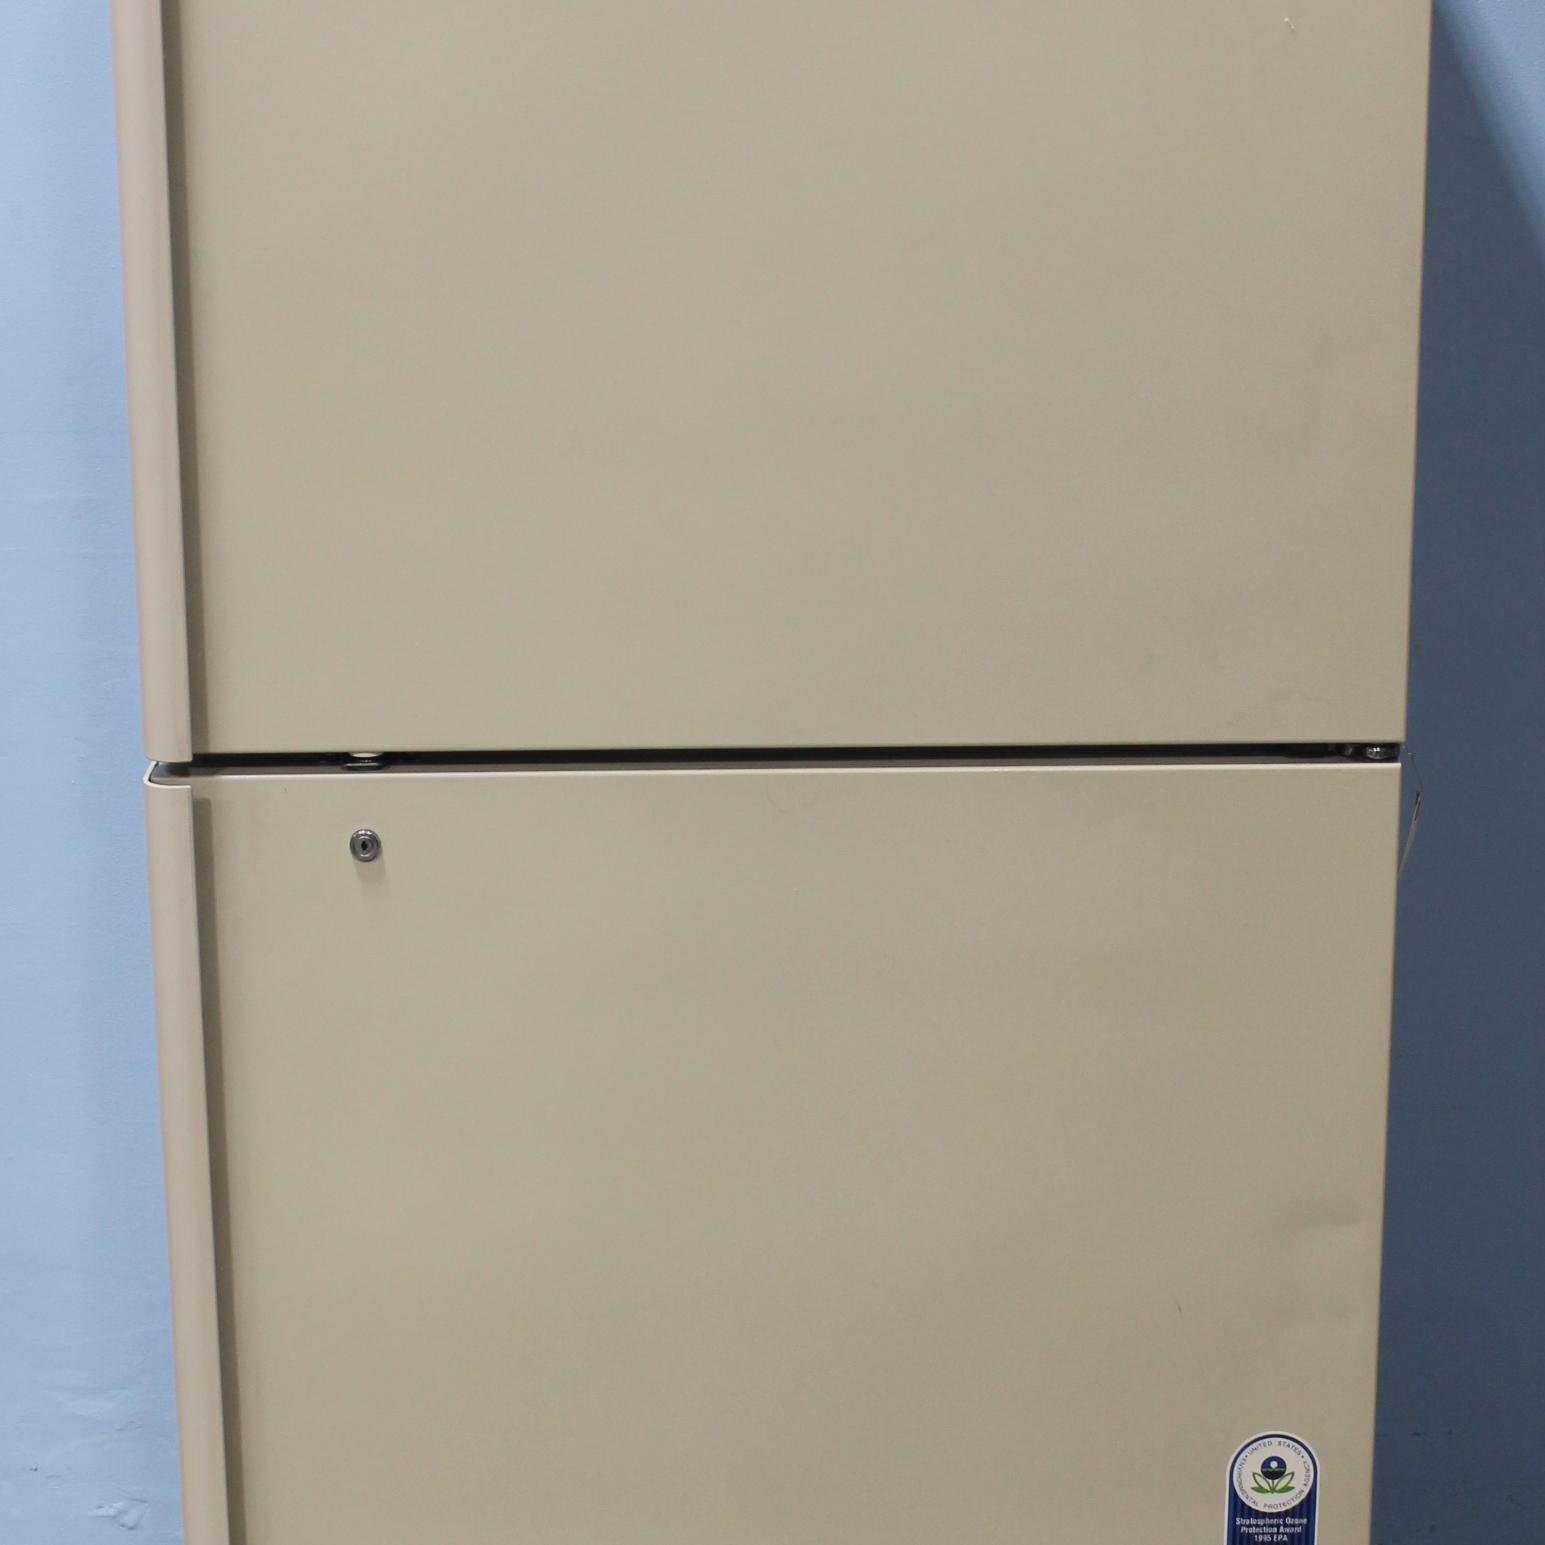 Sanyo MDF-U536D Biomedical Freezer Image